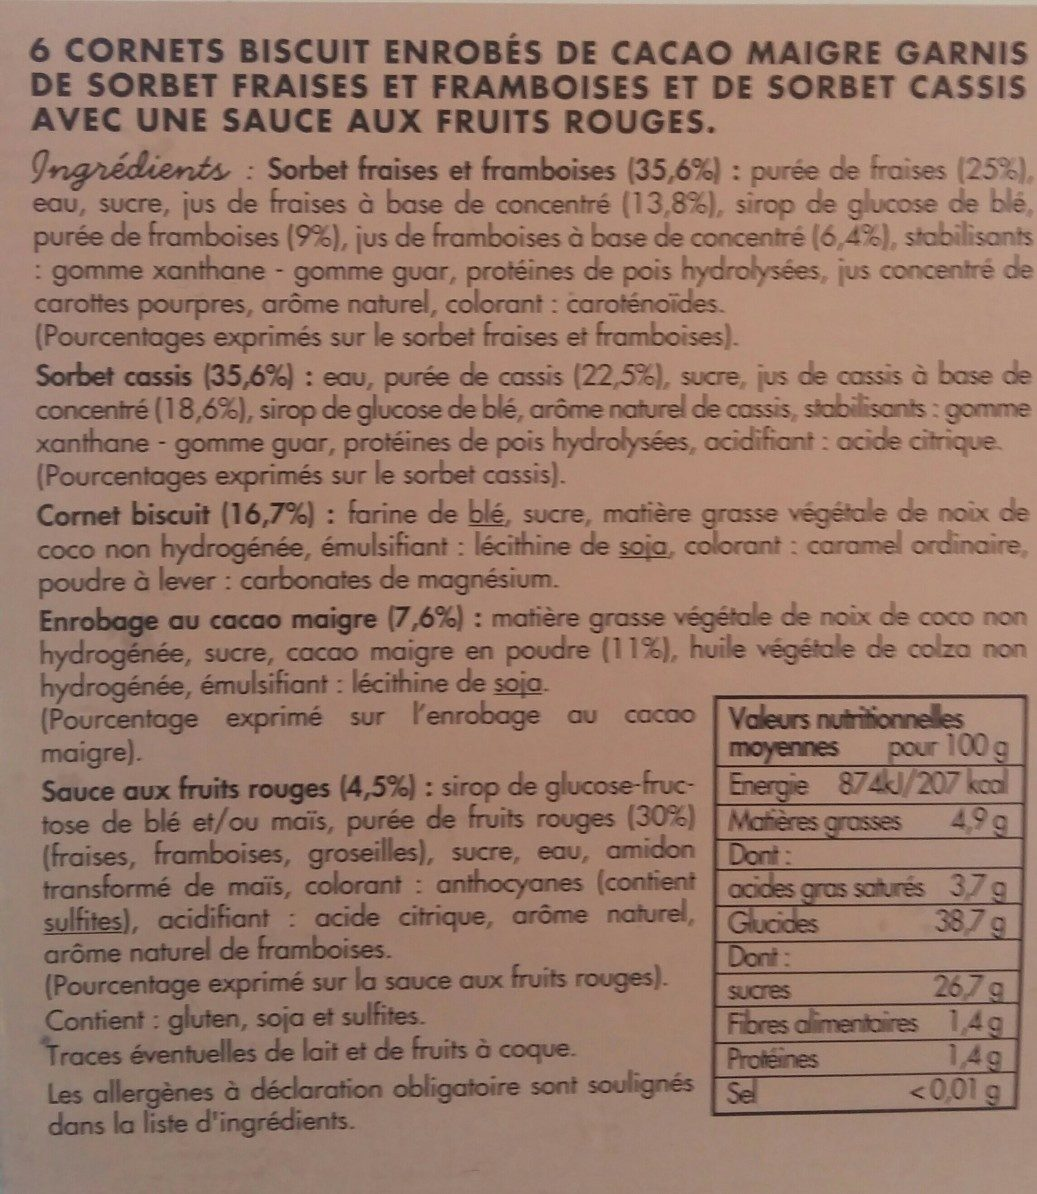 6 cônes fruits rouges - Ingrédients